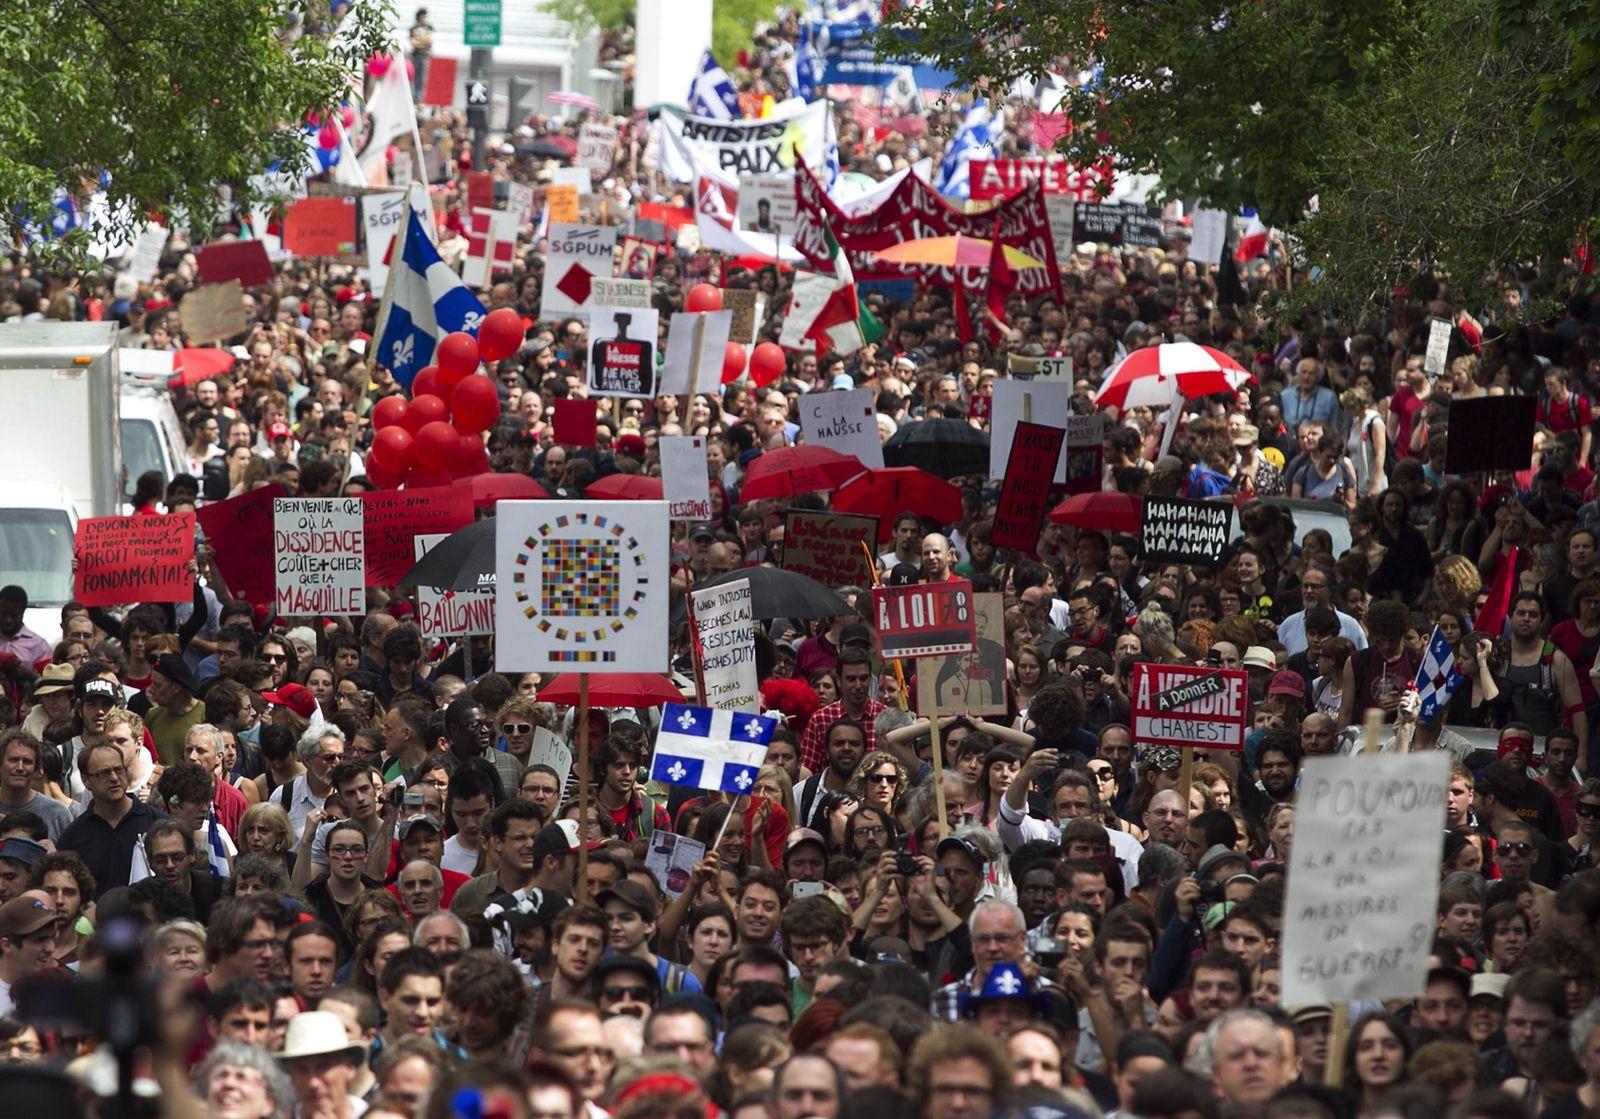 Studentenproteste / Québec